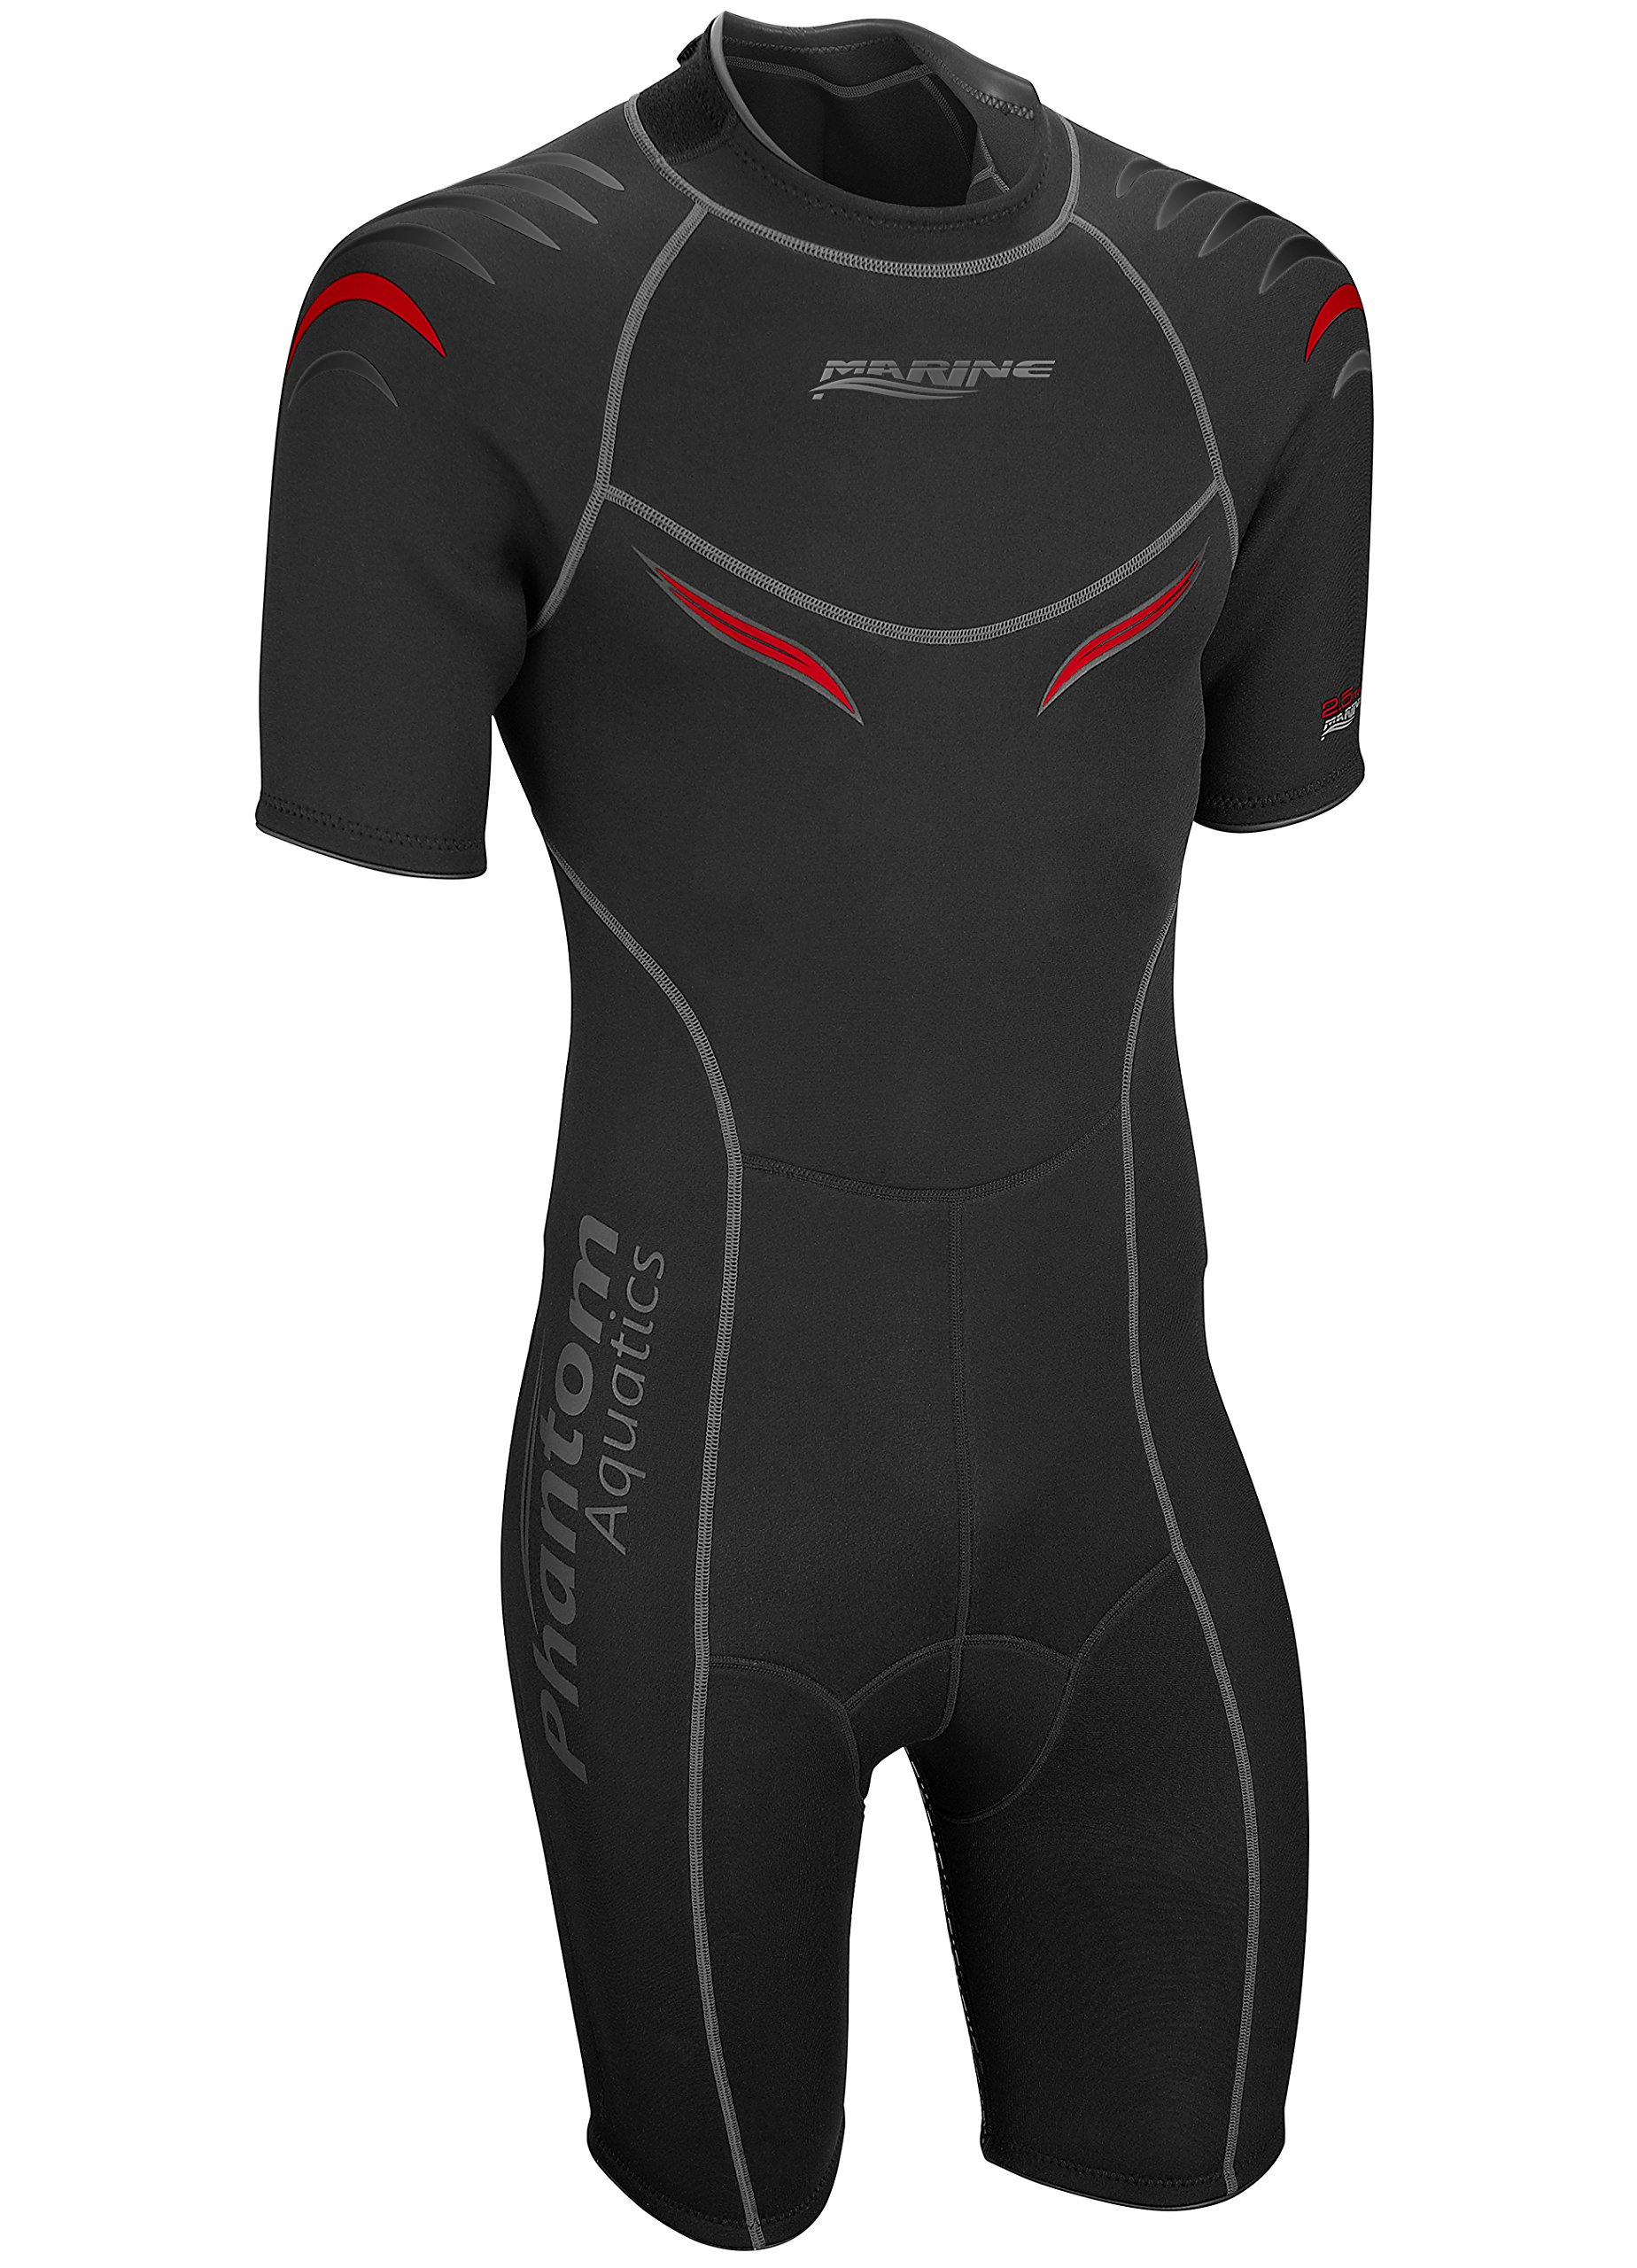 Phantom Aquatics Marine Men's Shorty Wetsuit, Black Red - Small